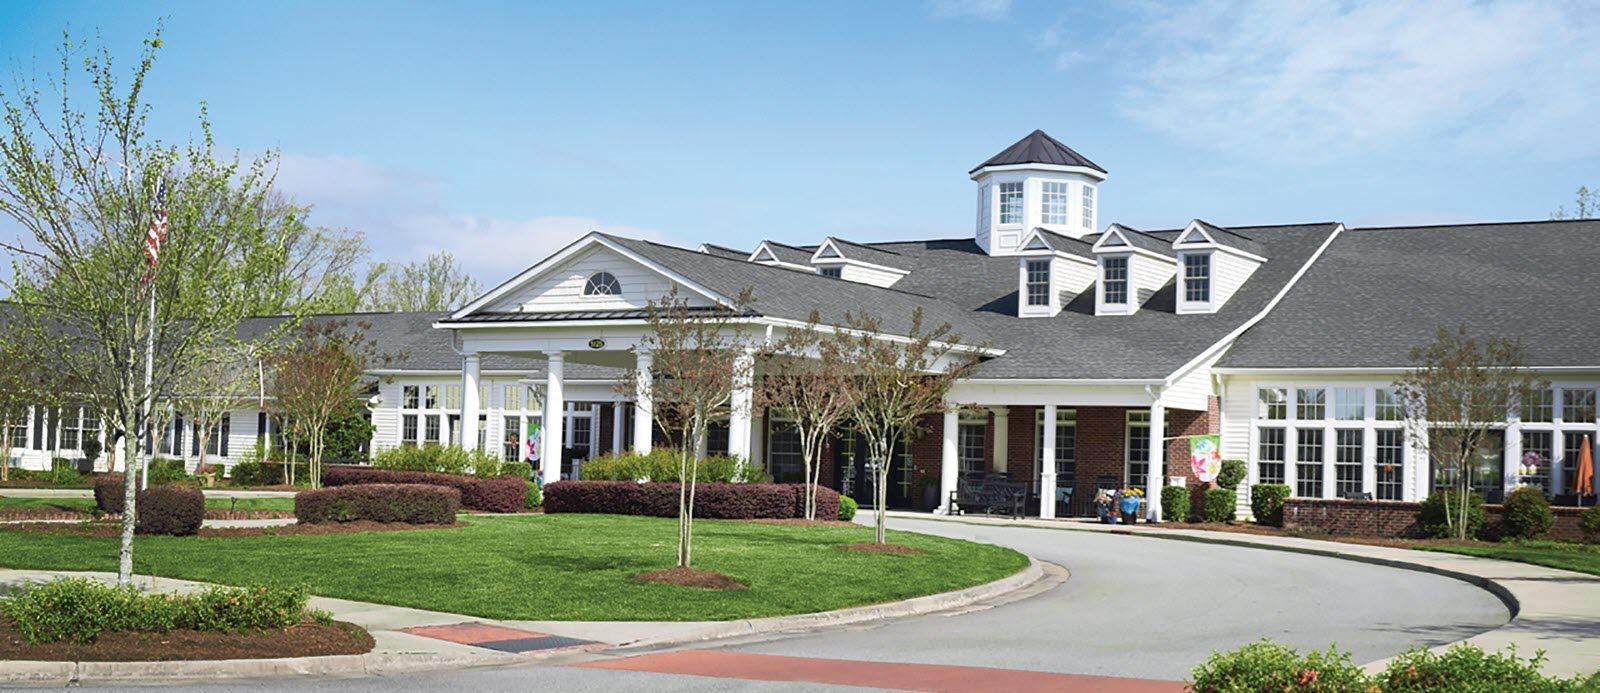 Community Exterior at Spring Arbor Senior Living, Spring Arbor of Greensboro, North Carolina